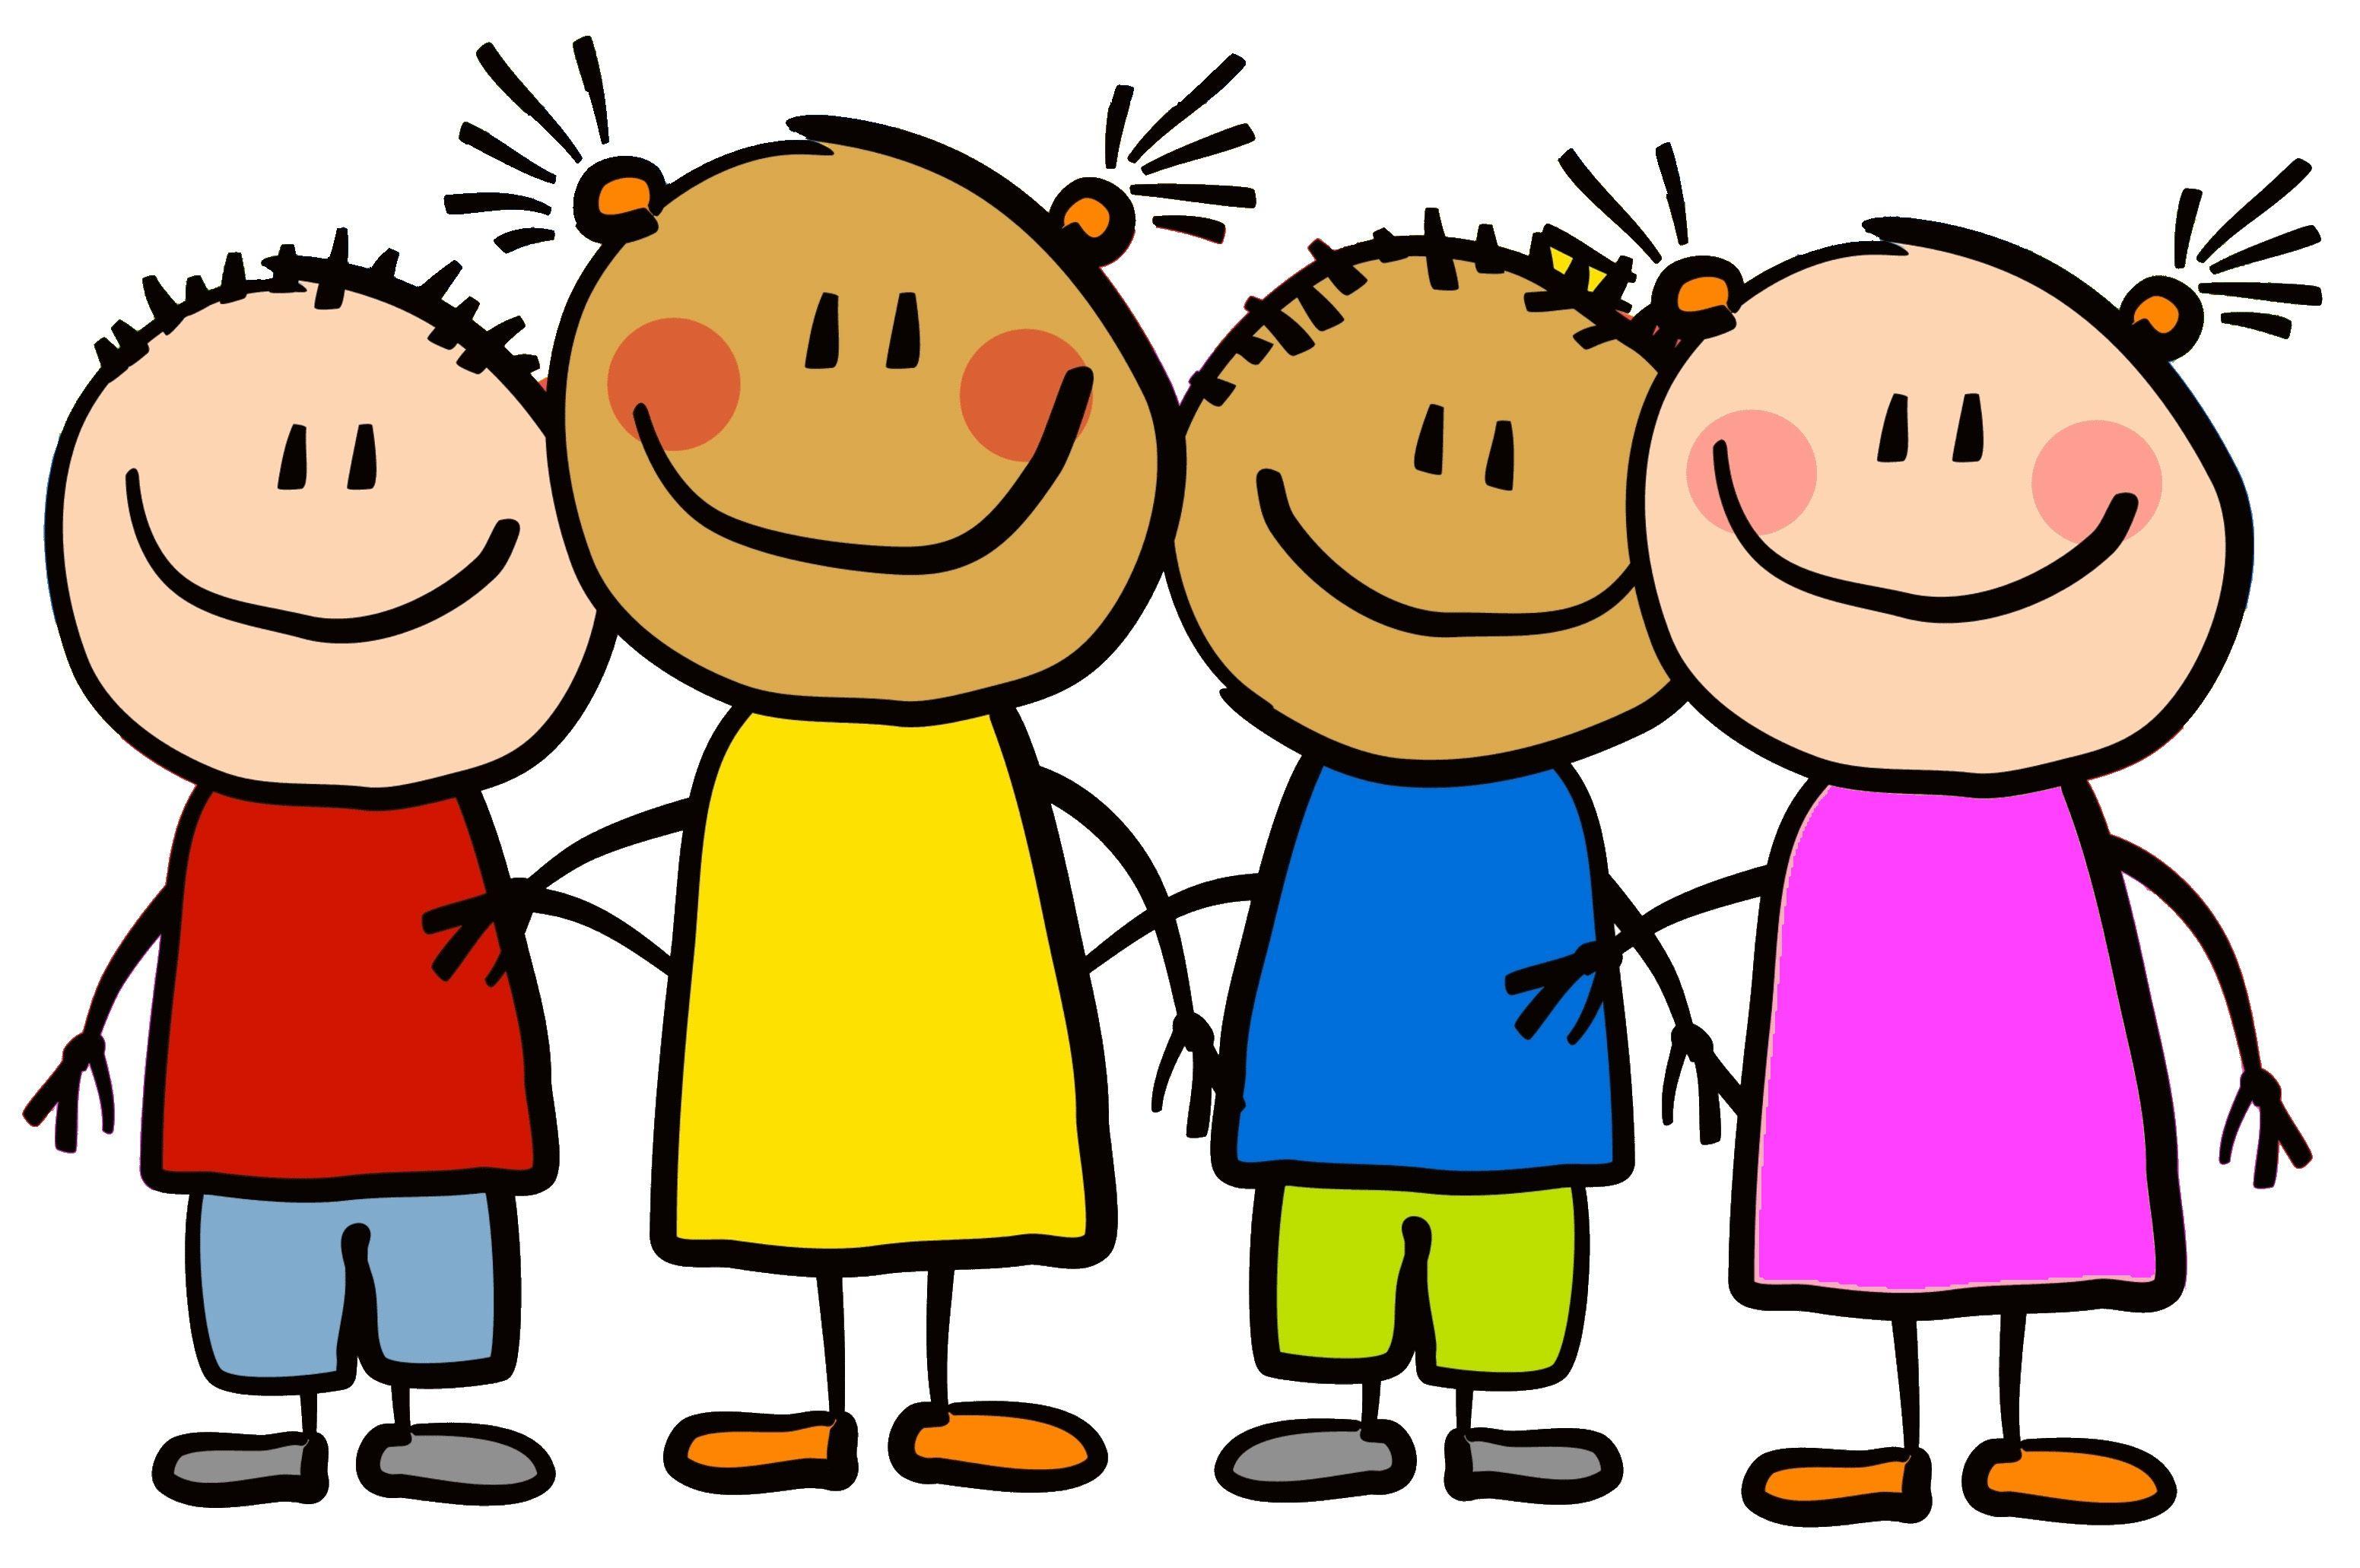 Daily GOOD News Magazine | Free clip art, Clip art, Art for kids